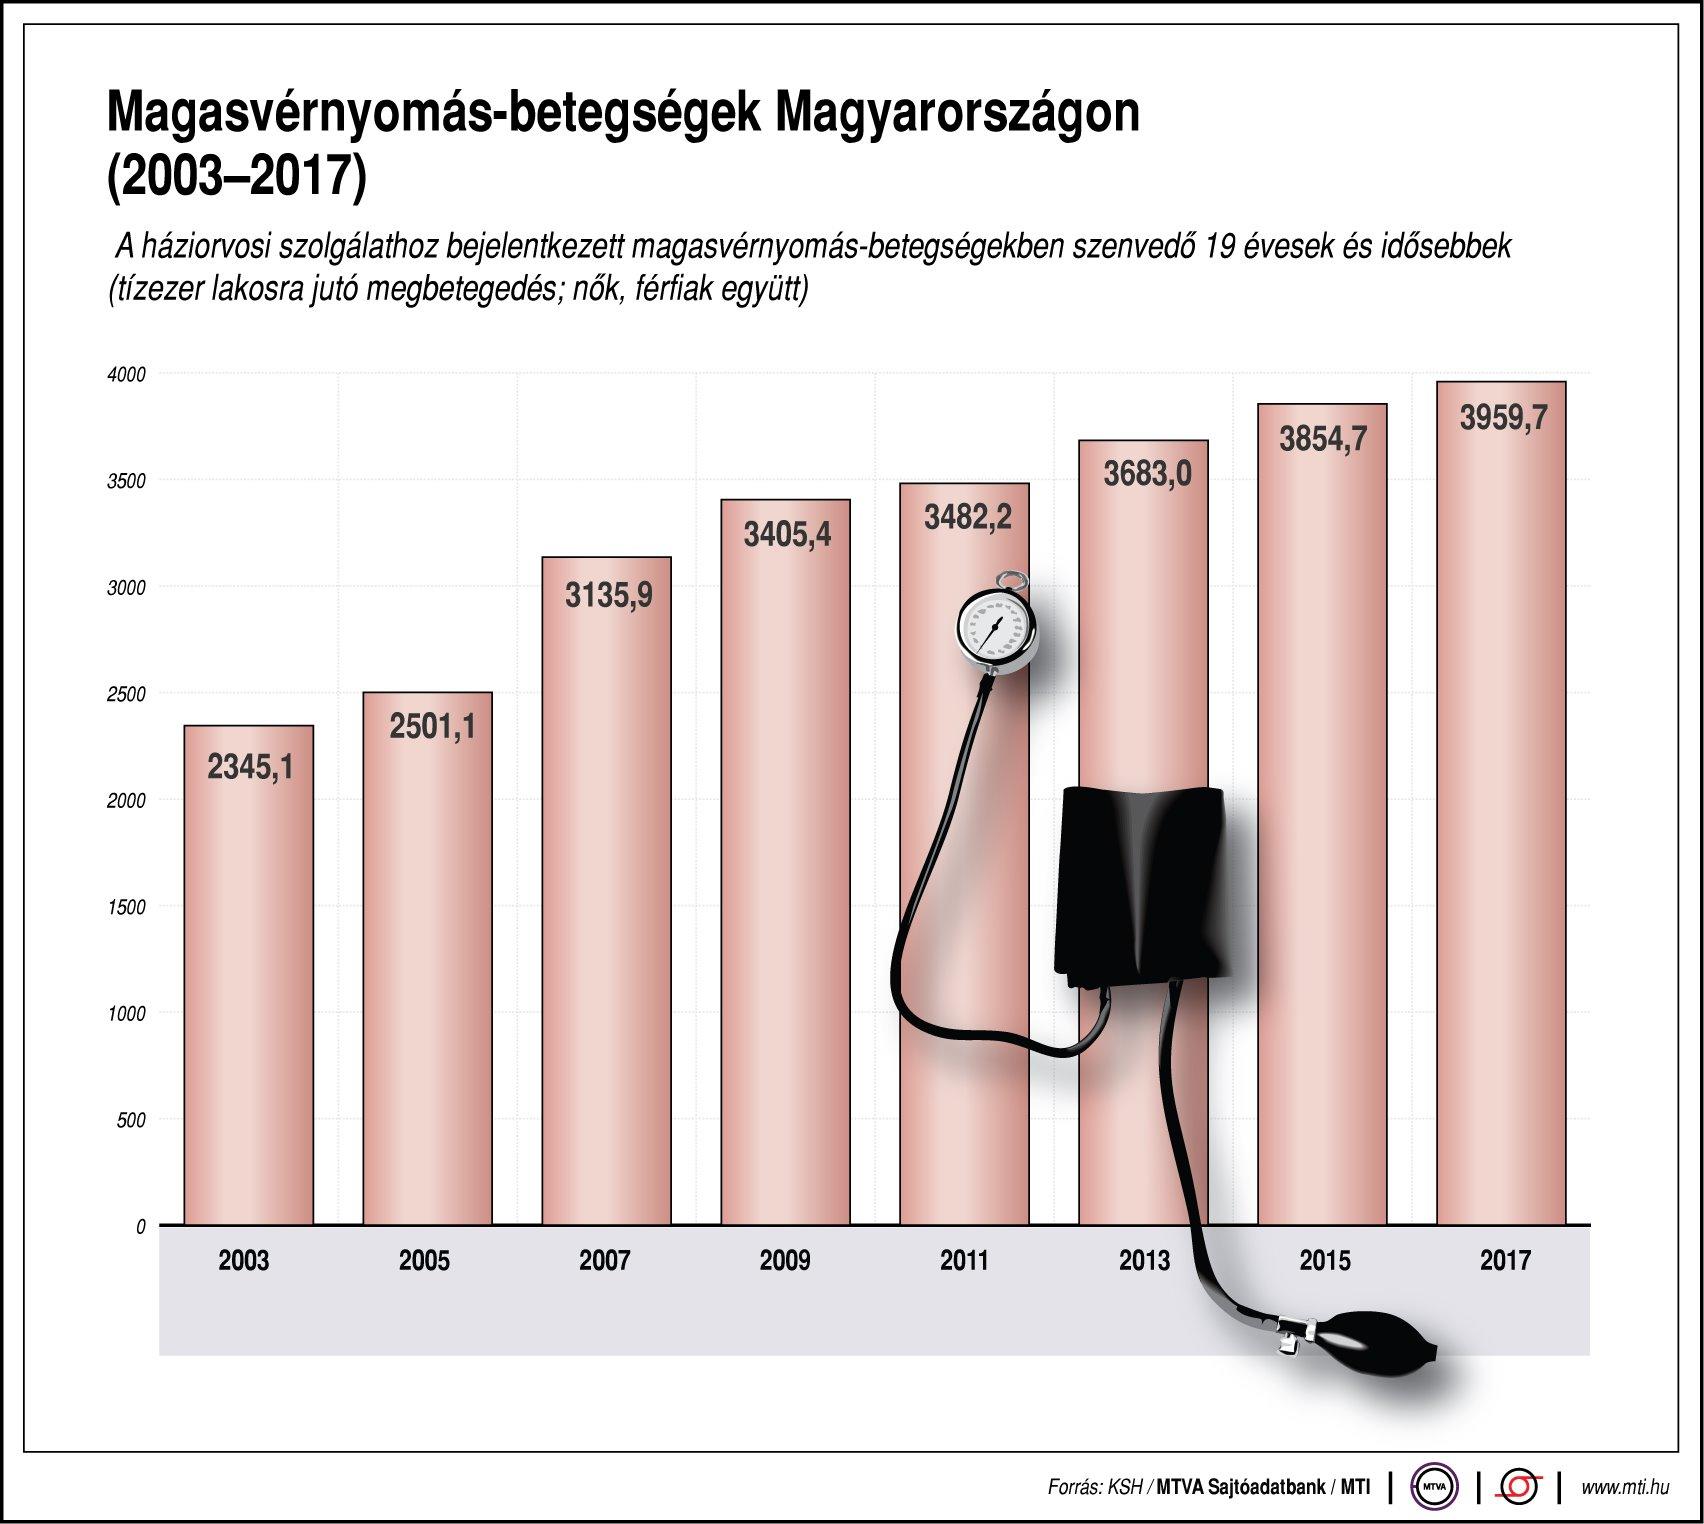 magas vérnyomás nyugdíjak